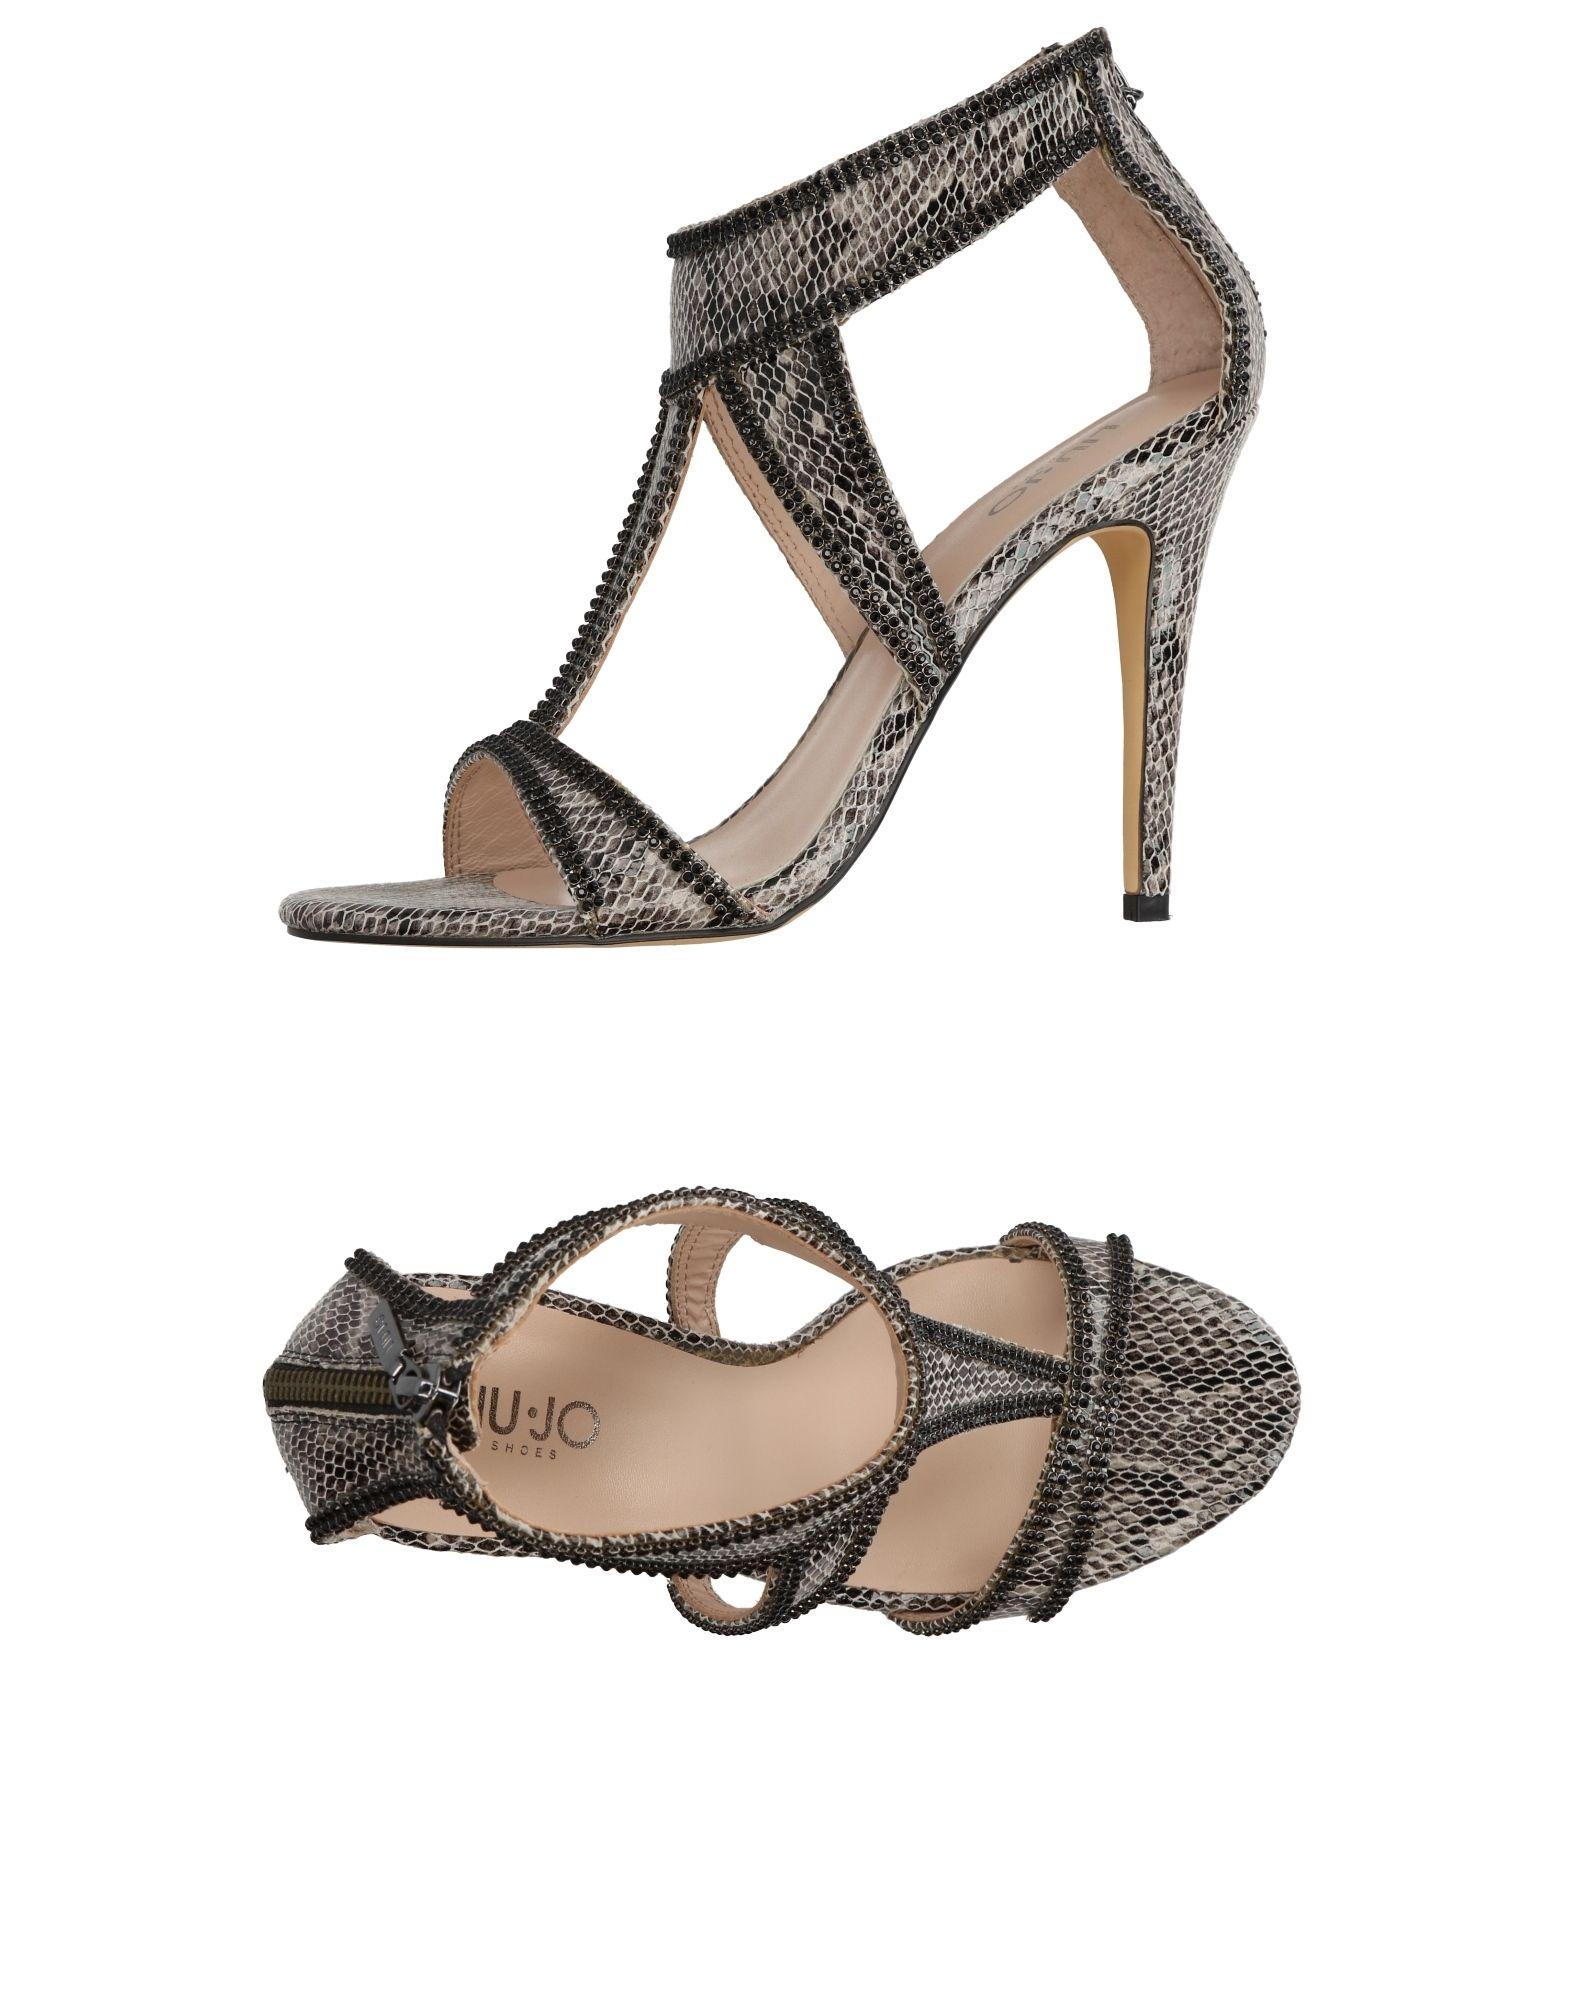 Liu •Jo Schuhes Sandalen Damen Gutes Preis-Leistungs-Verhältnis, Preis-Leistungs-Verhältnis, Preis-Leistungs-Verhältnis, es lohnt sich bdb802